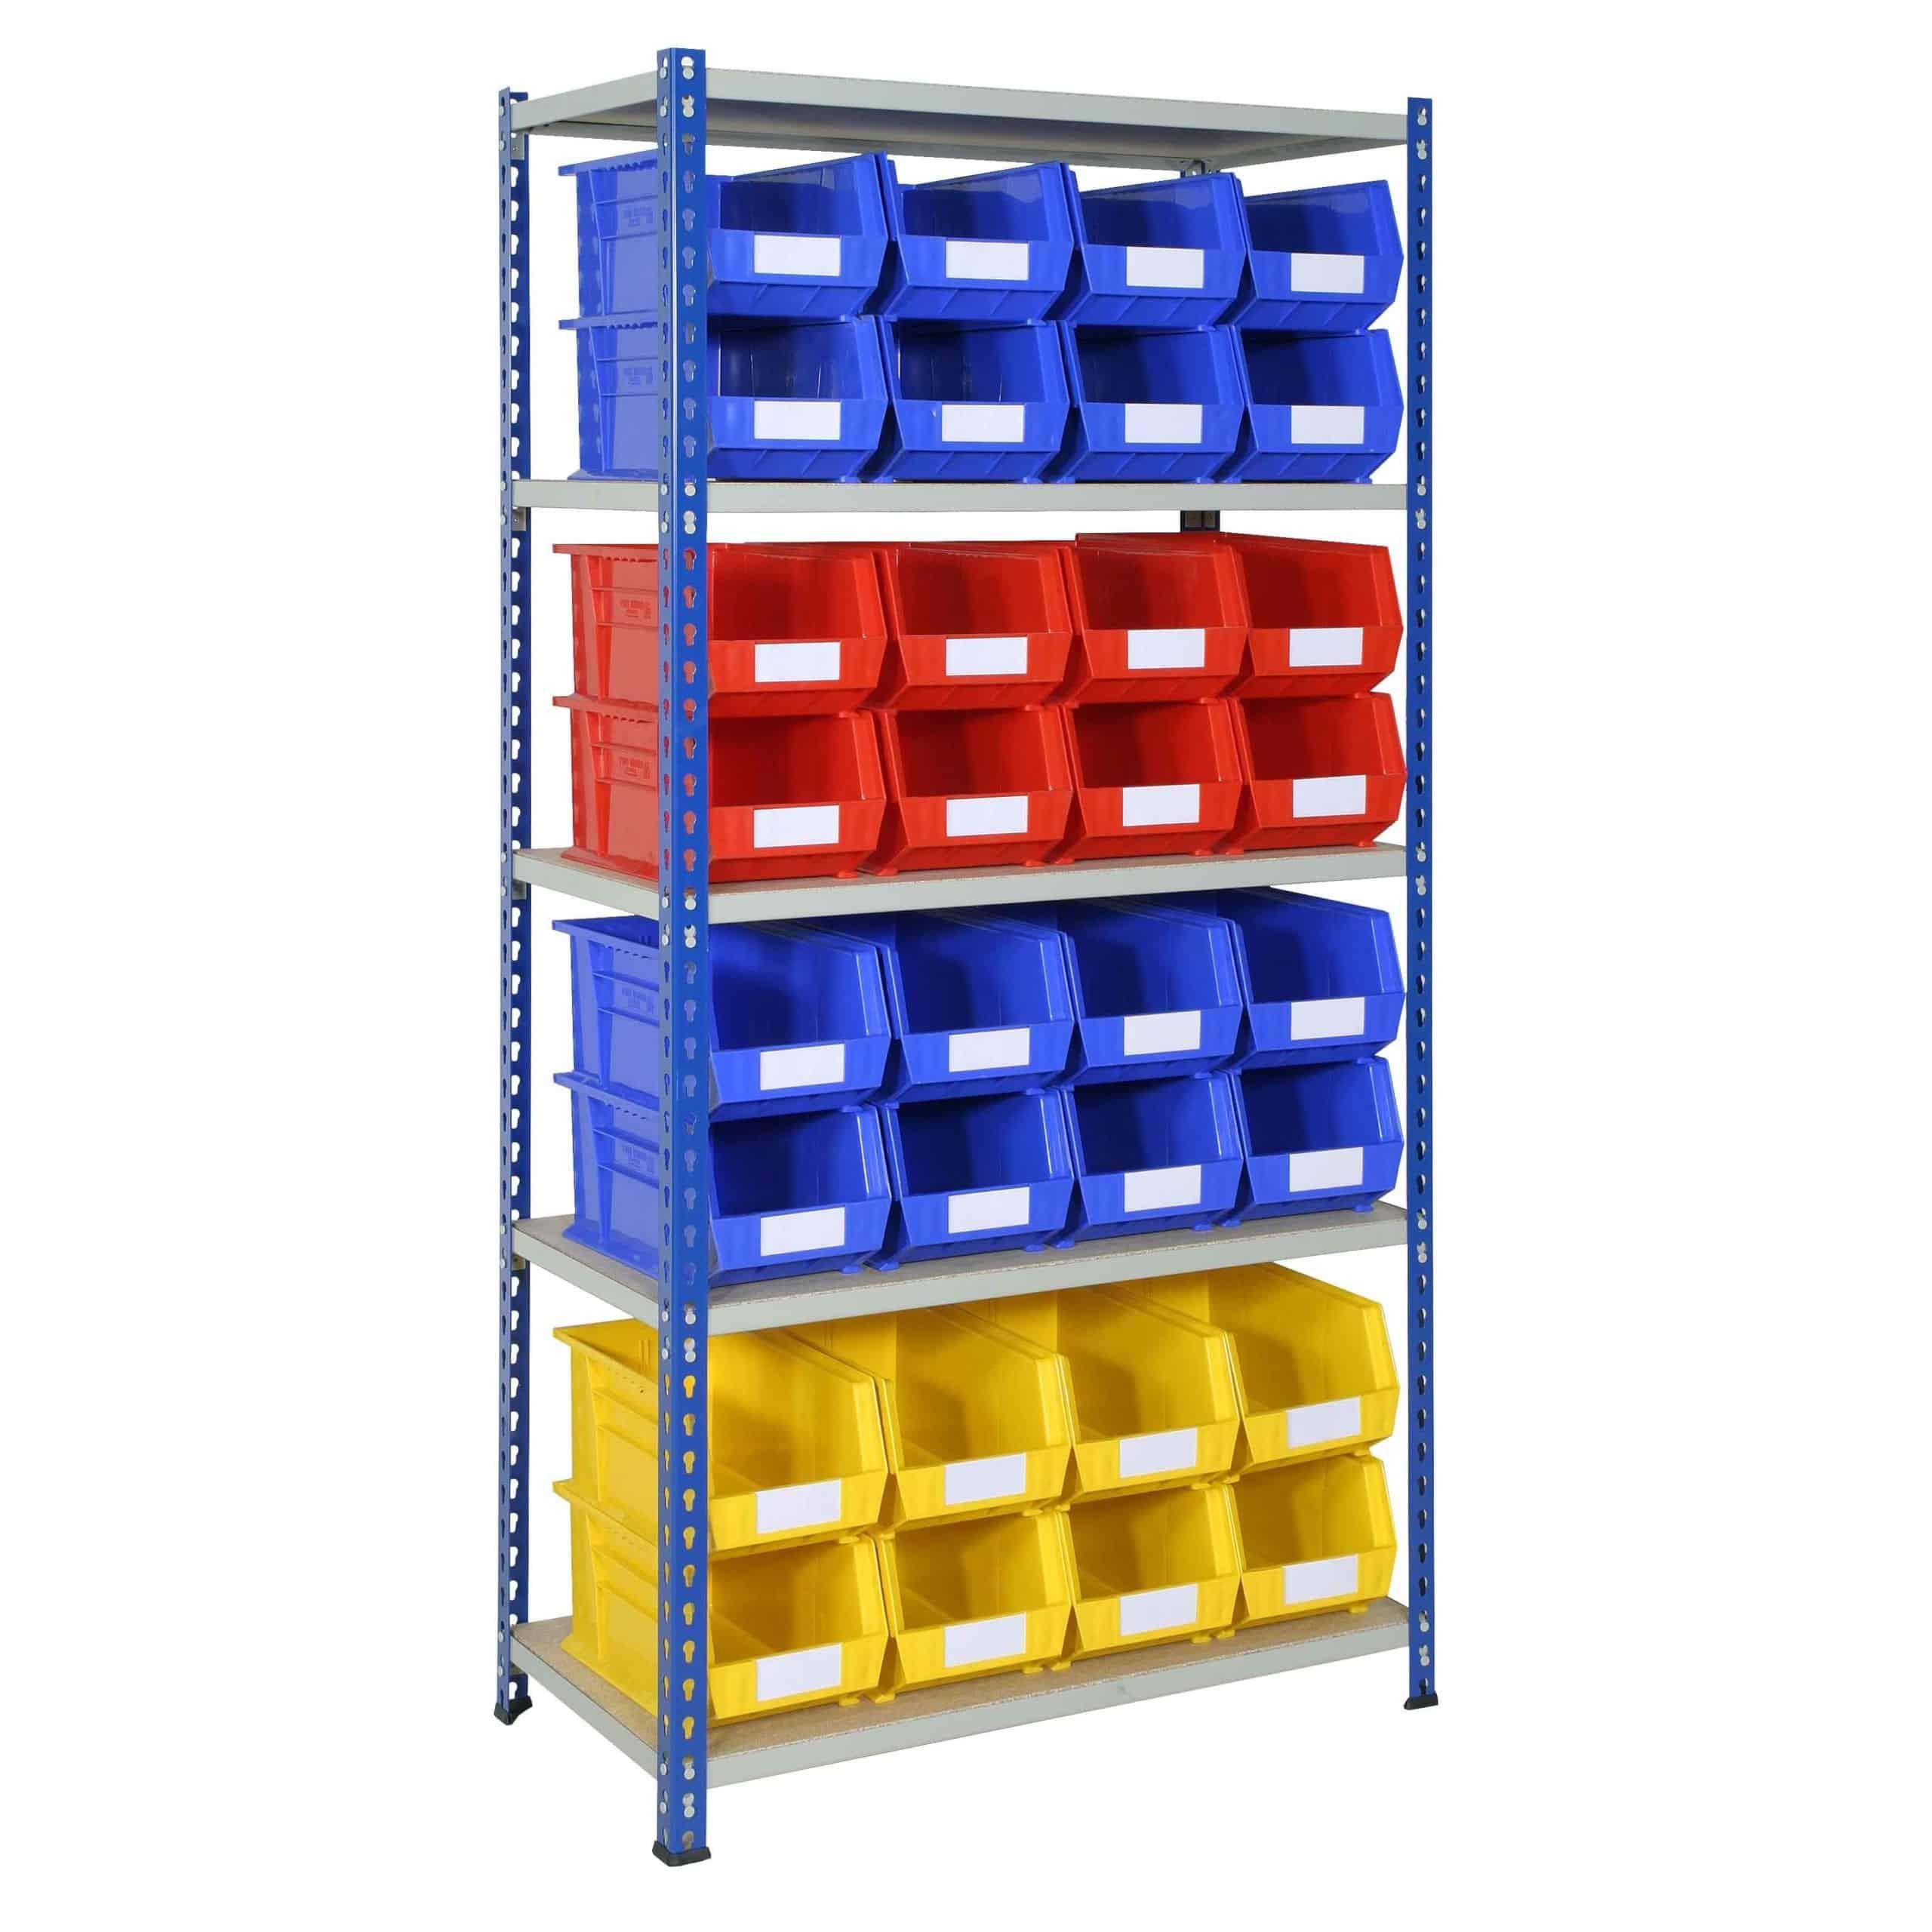 J Rivet Shelving with 32 Plastic Bins